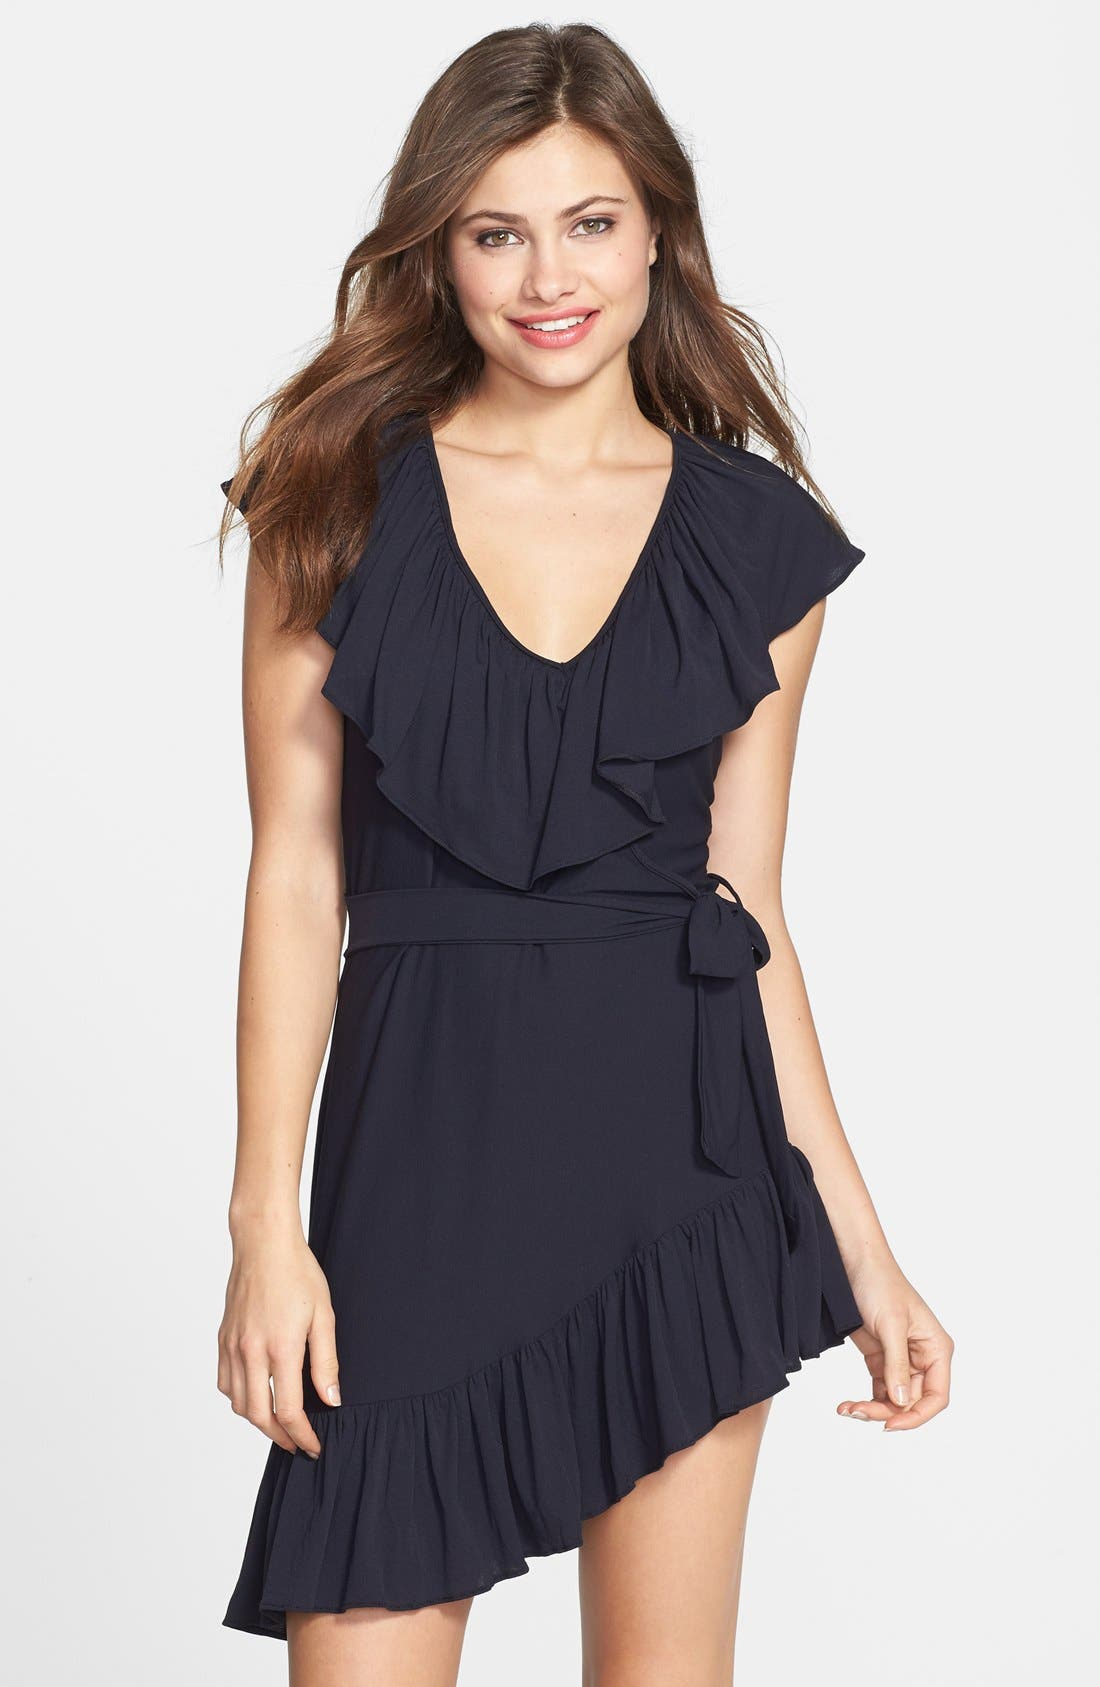 Alternate Image 1 Selected - Luli Fama 'Unwrap Me' Asymmetrical Ruffle Dress